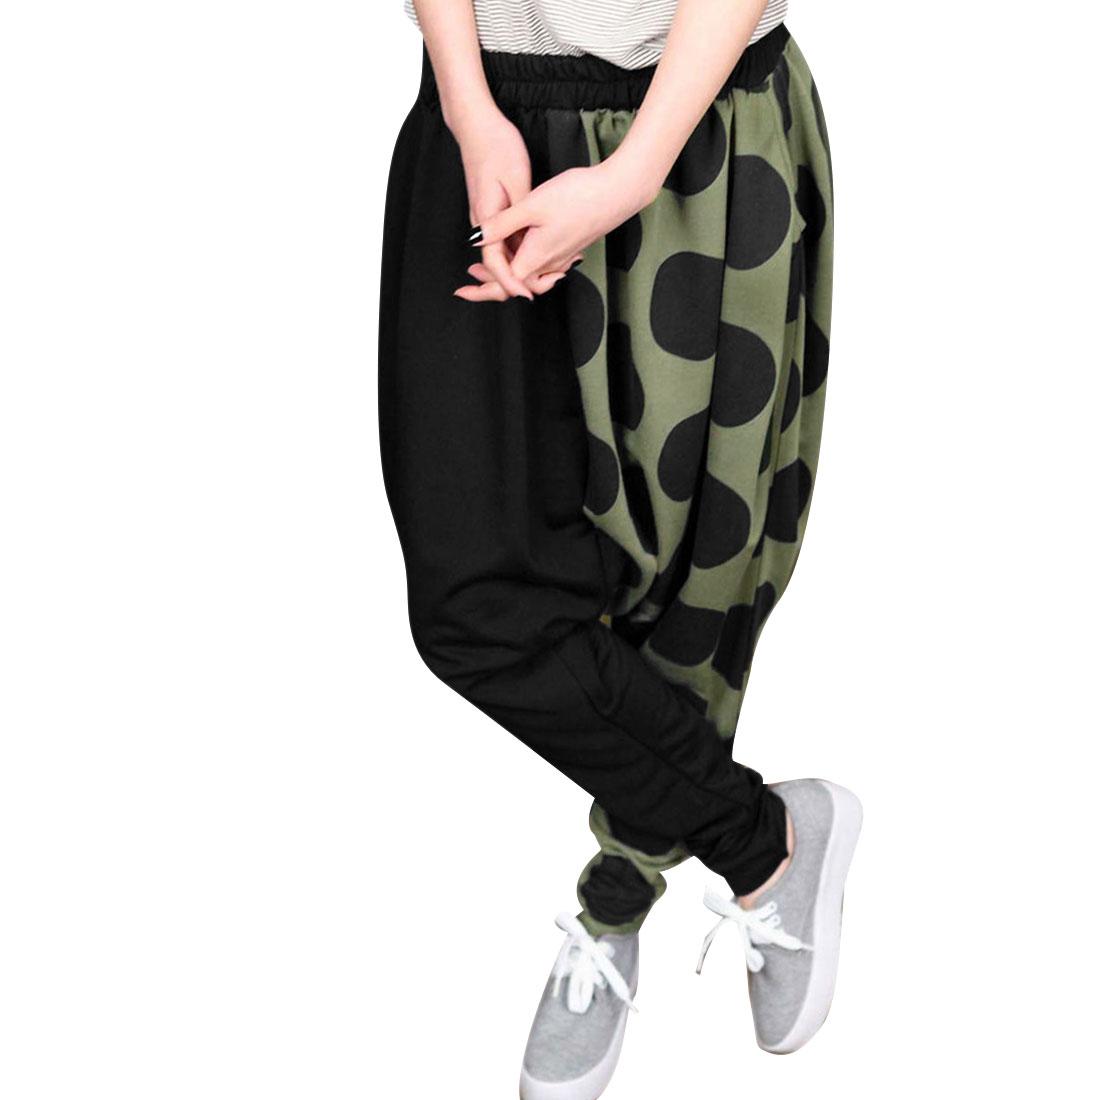 Women Elastic Waist Panel Dots Pattern Harem Pants Olive Green M